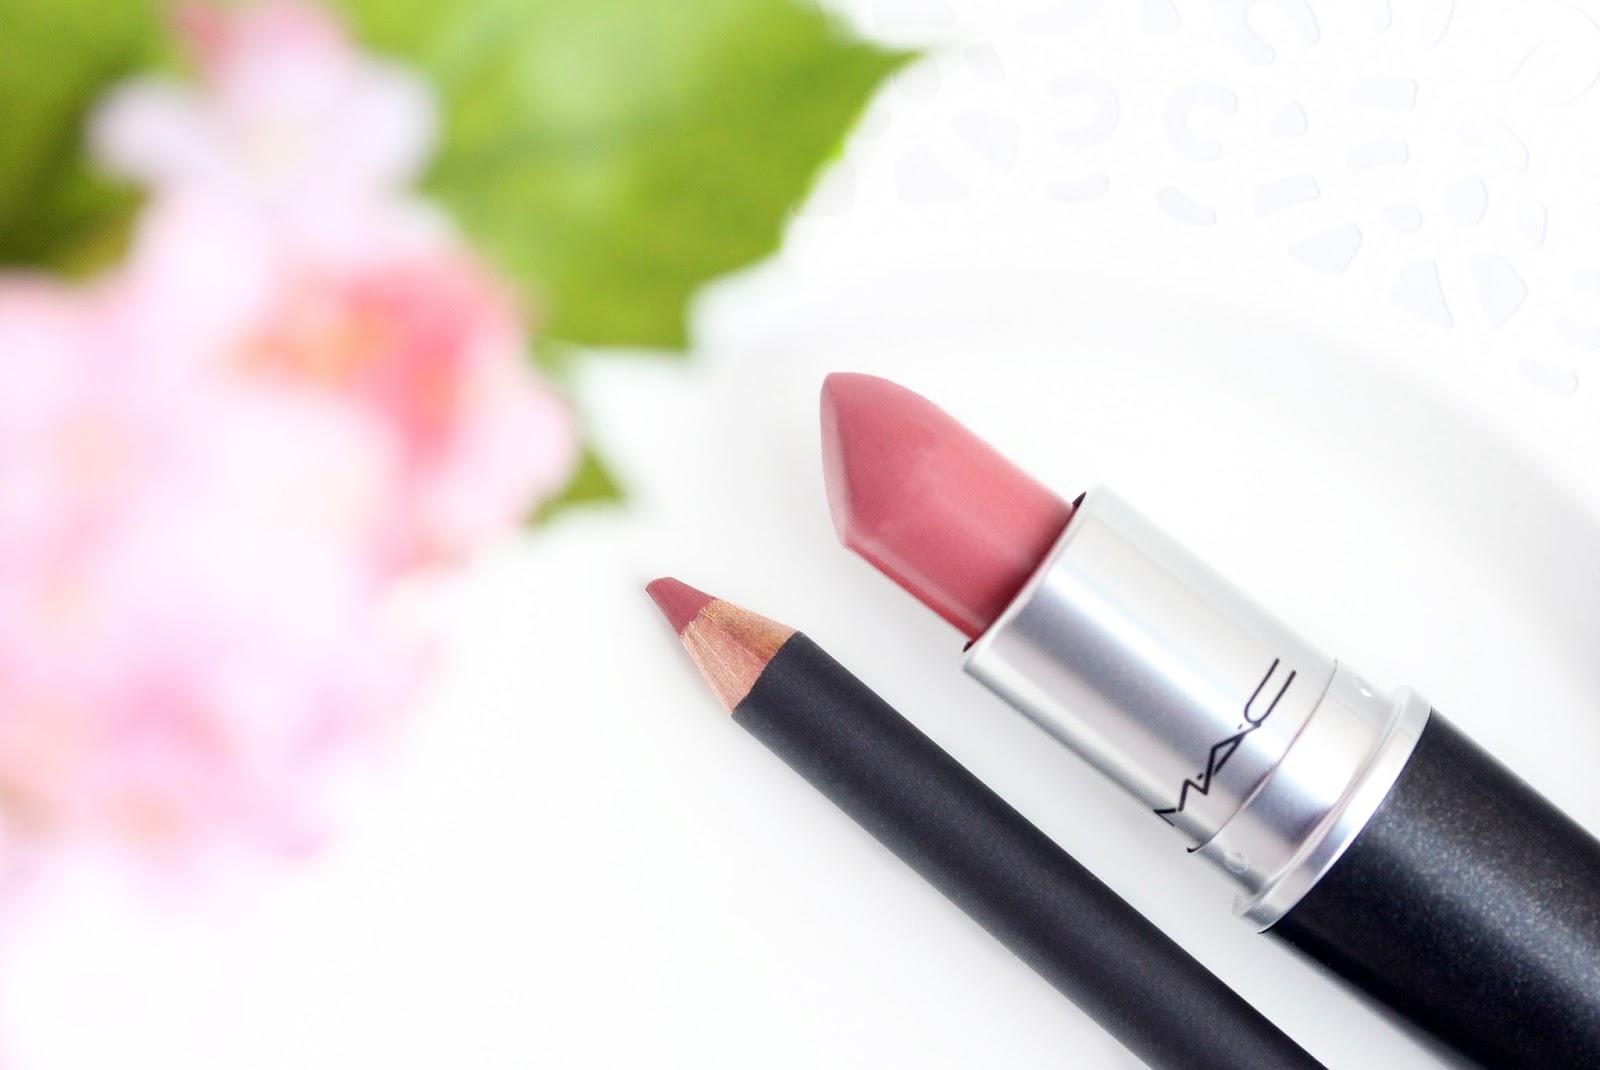 mac soar lip pencil and mac brave lipstick